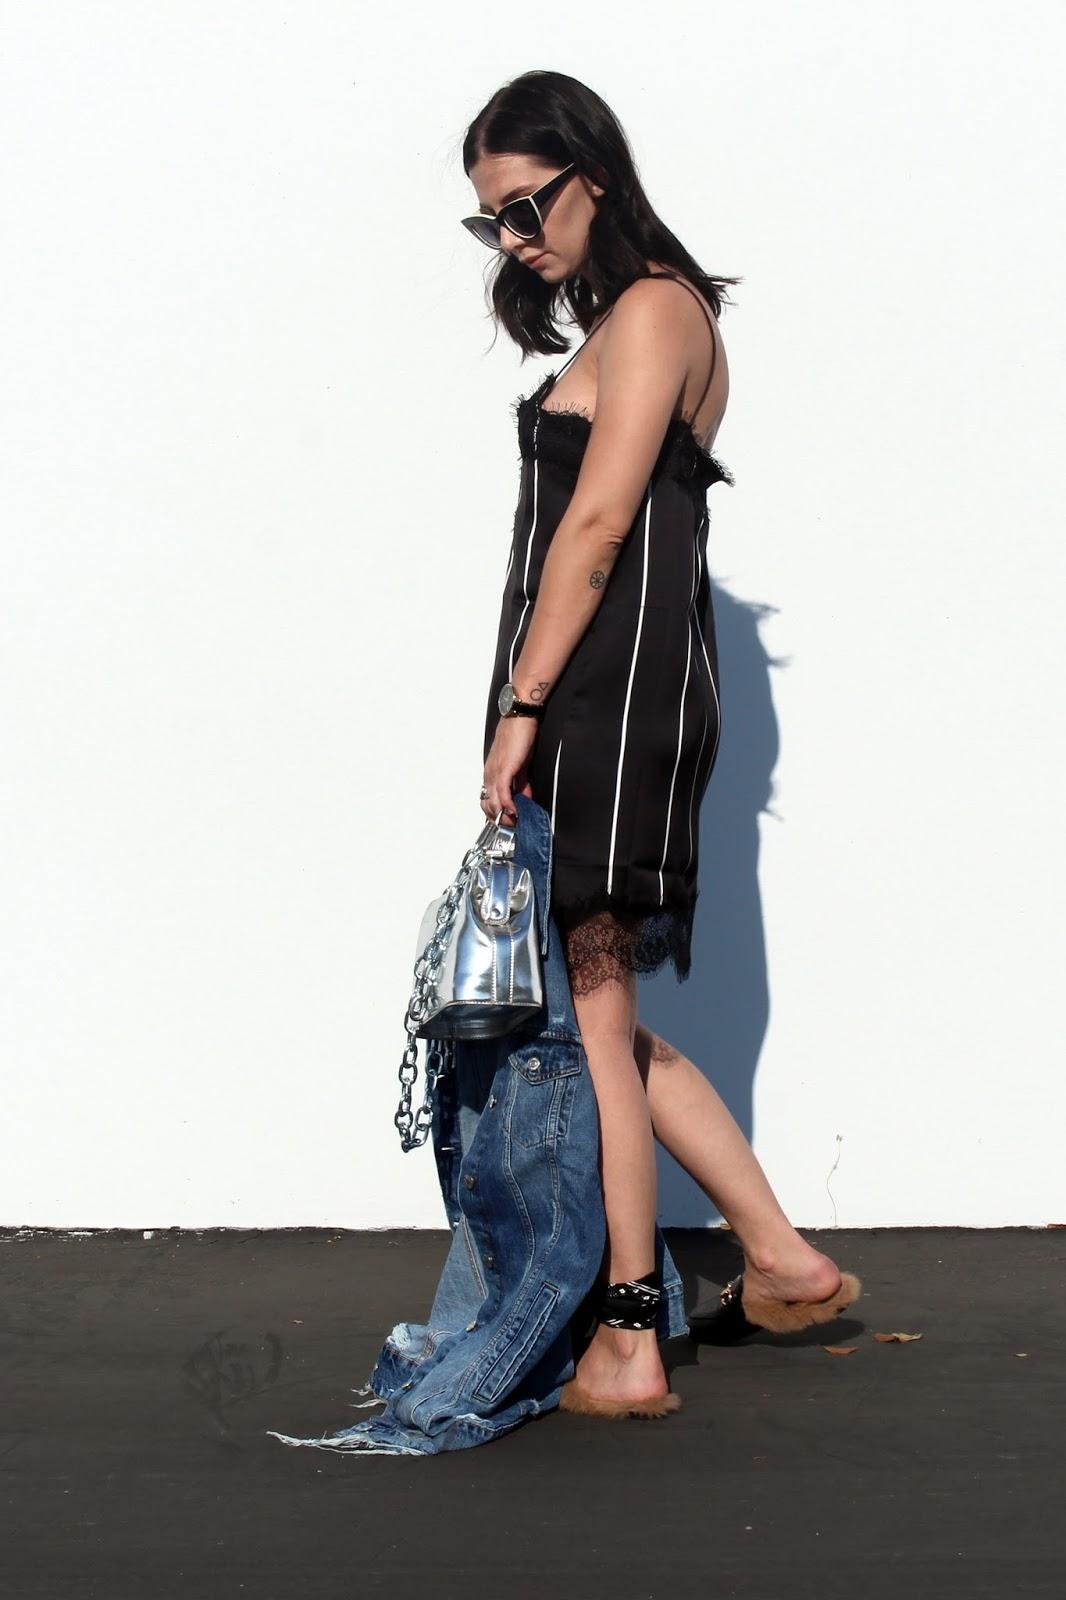 slip dress trend, loafers, denim jacket